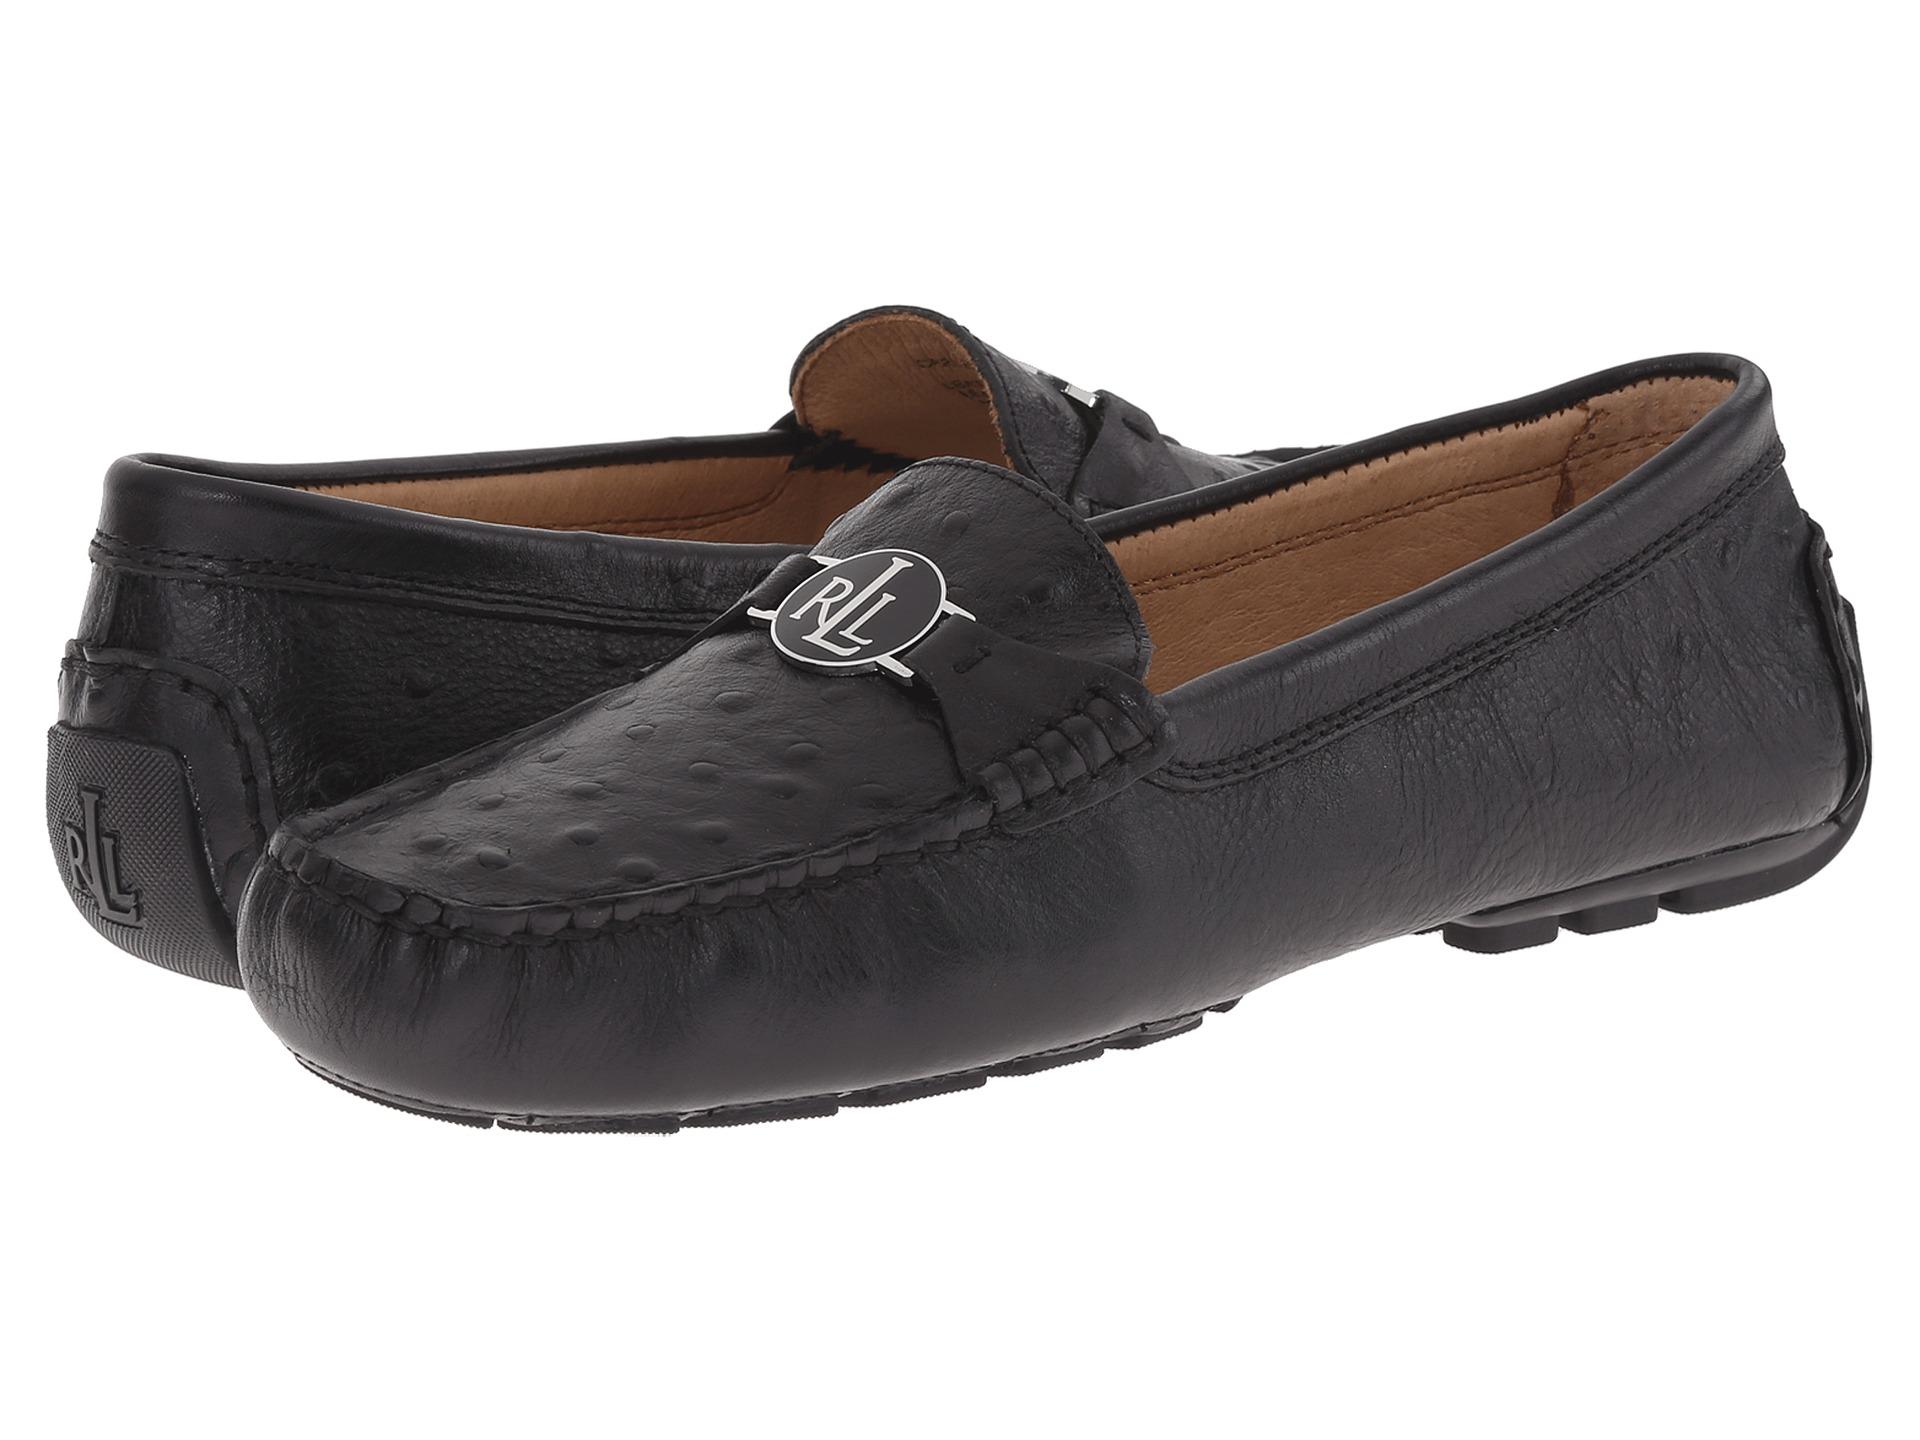 d9a44218dd5 polo ralph lauren hat leather strap carley by ralph lauren women shoes